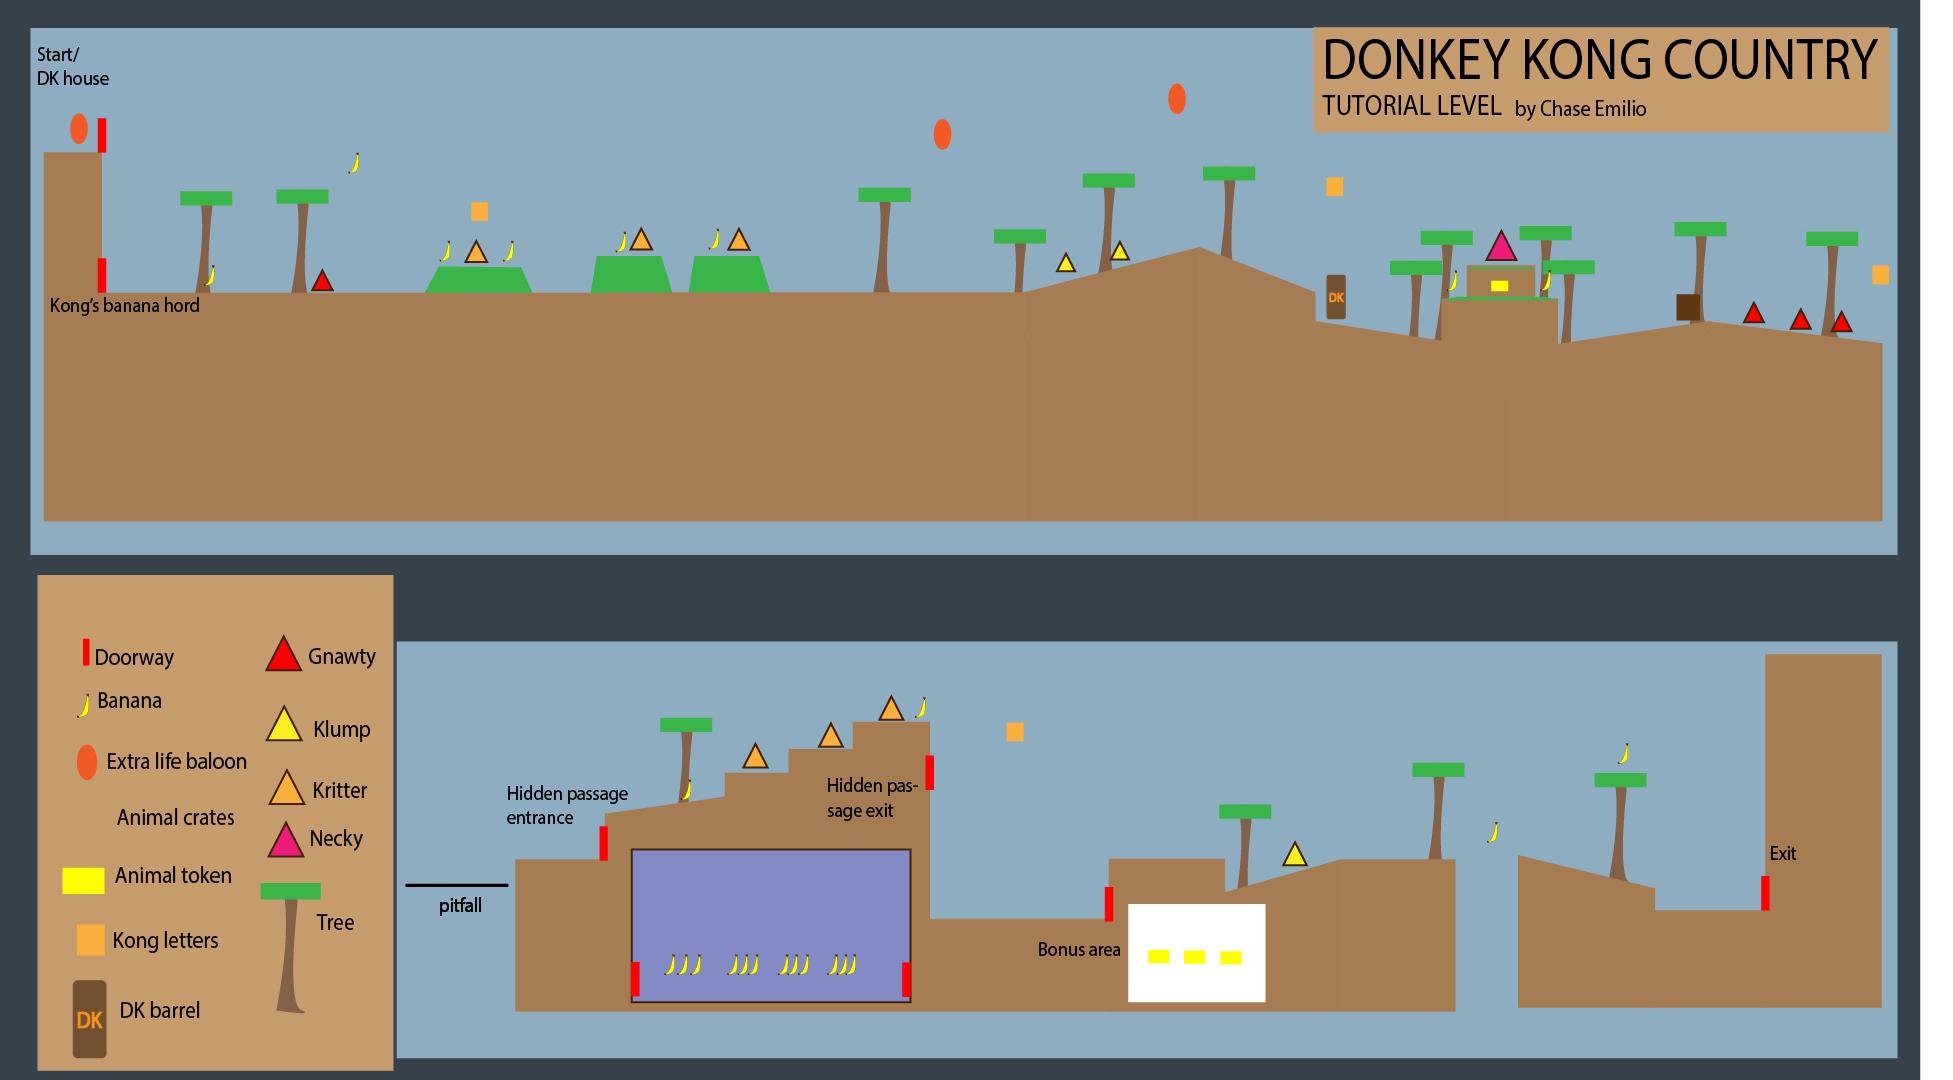 My level layout